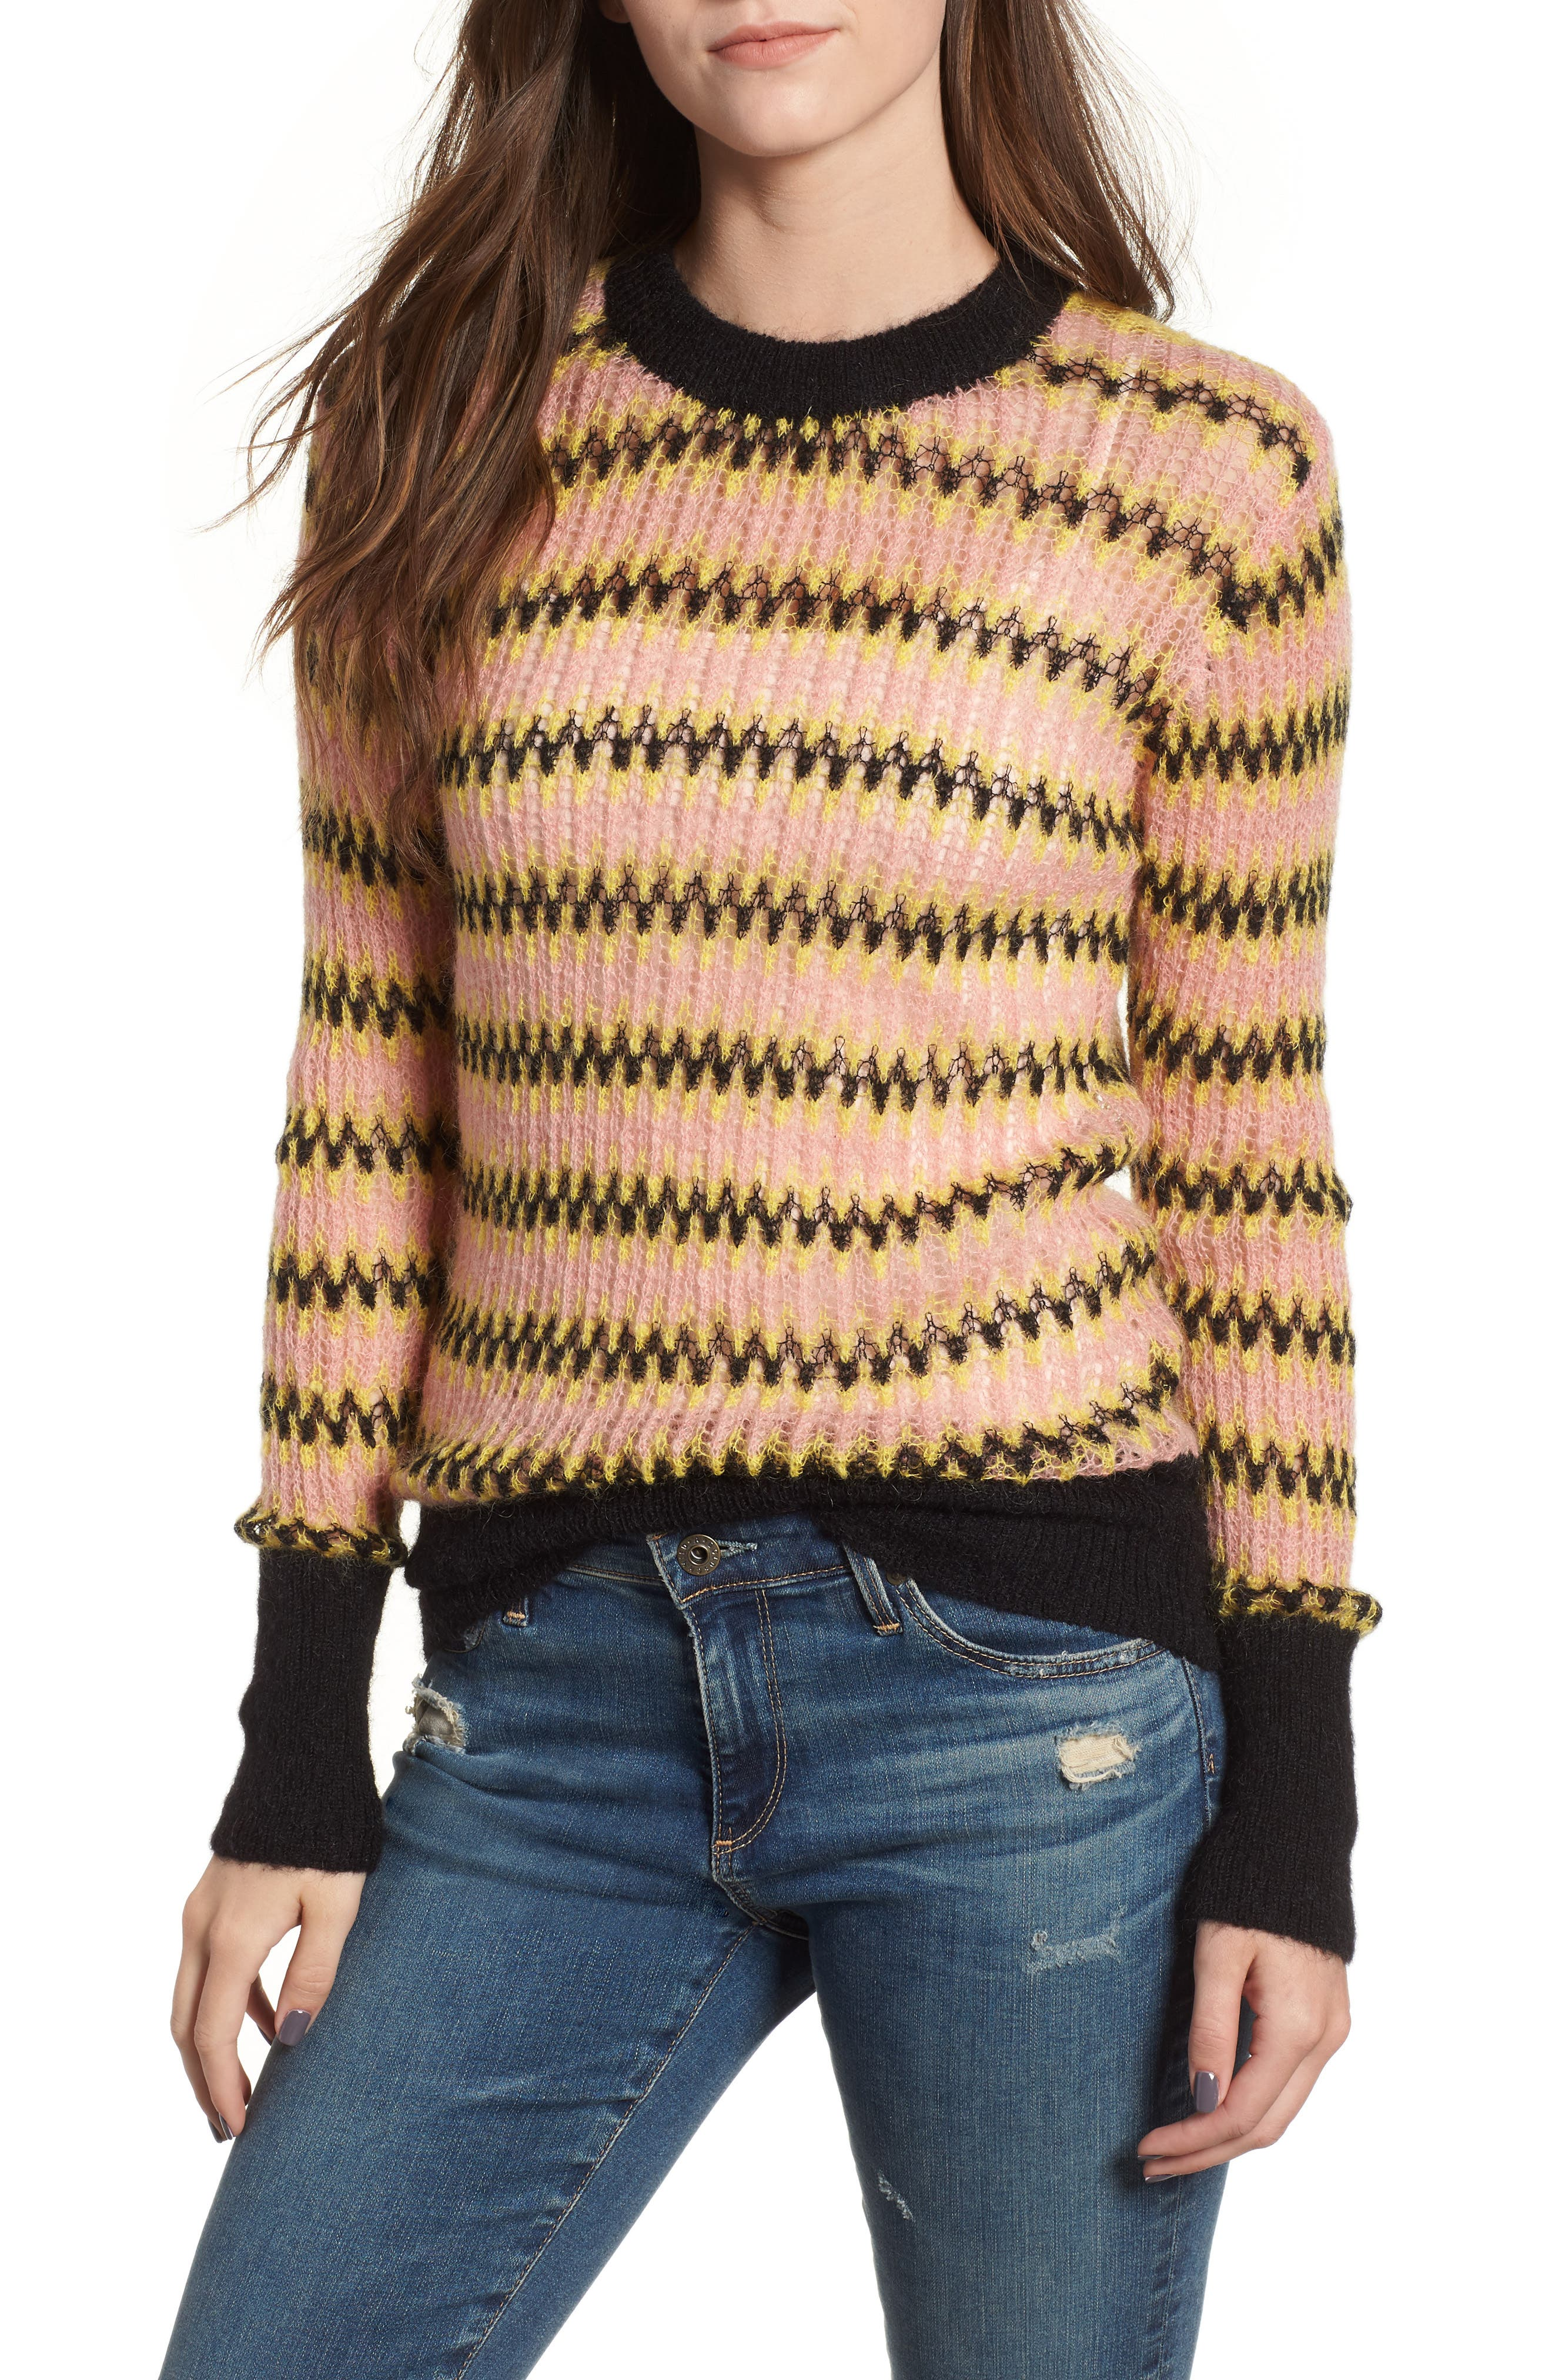 Zig Zag Wool Blend Sweater,                             Main thumbnail 1, color,                             MULTI PINK YELLOW ZIGZAG PRINT